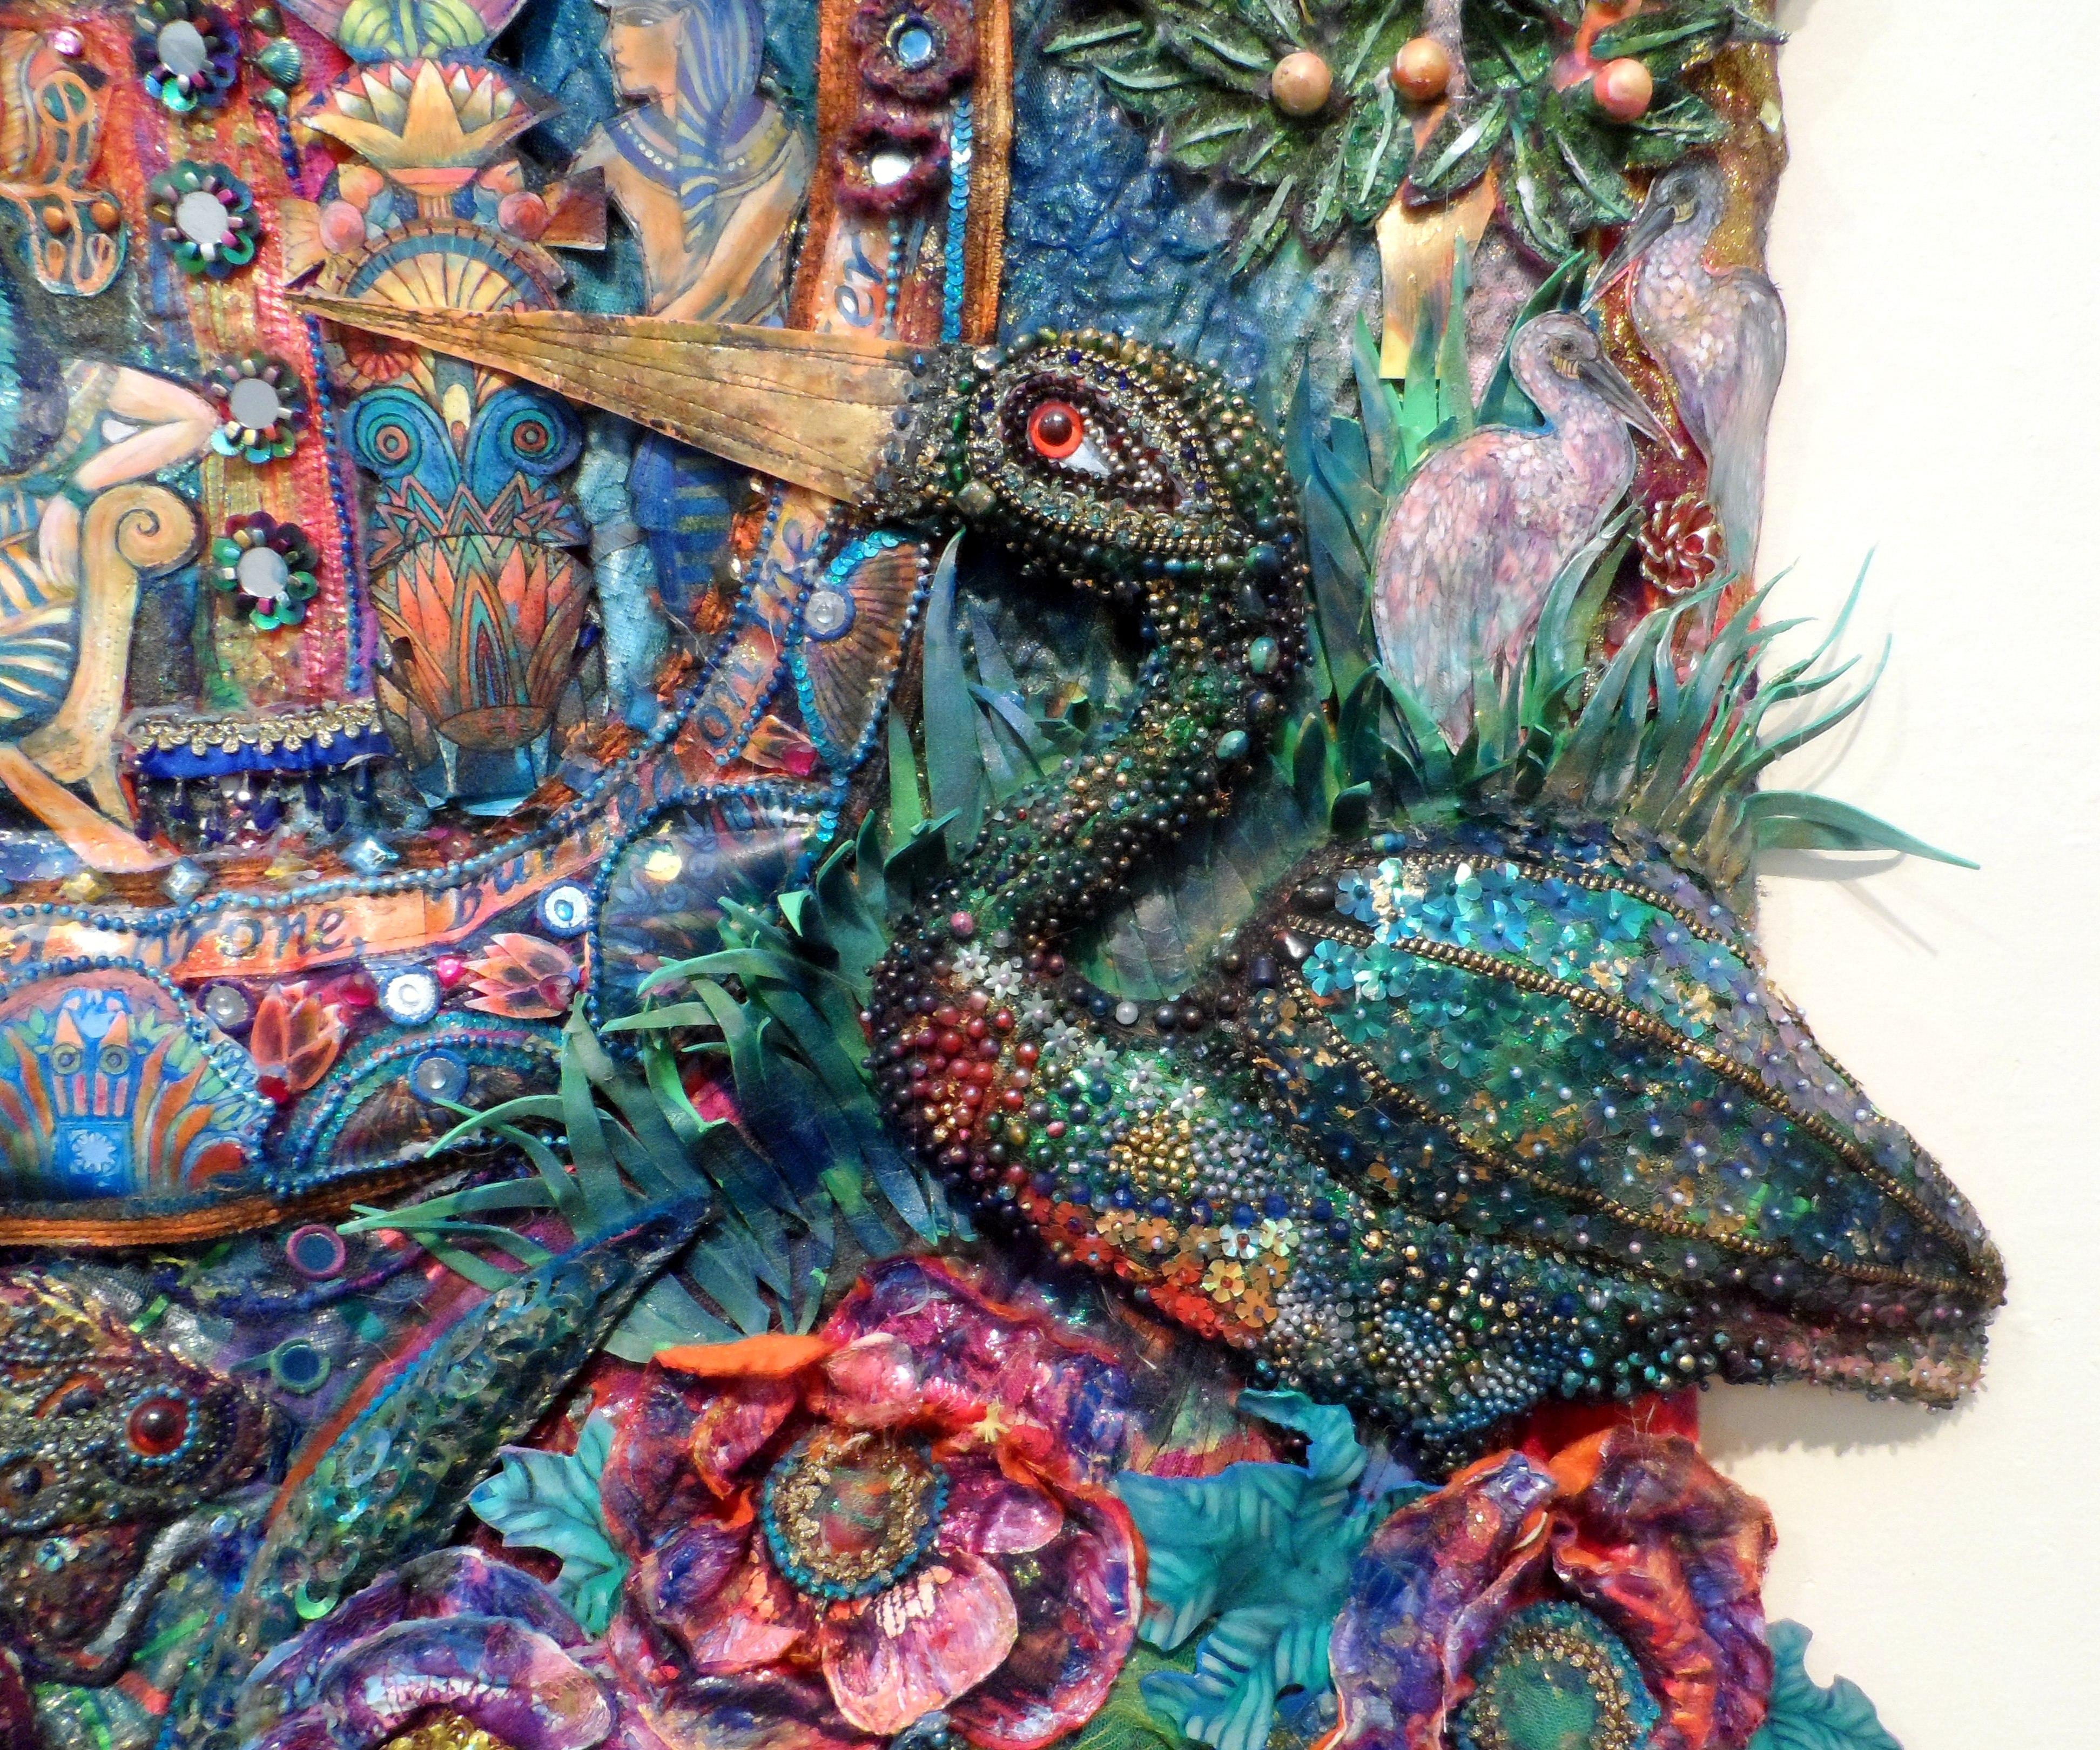 (detail) CLEOPATRA by Nikki Parmenter, Williamson Gallery, 2019